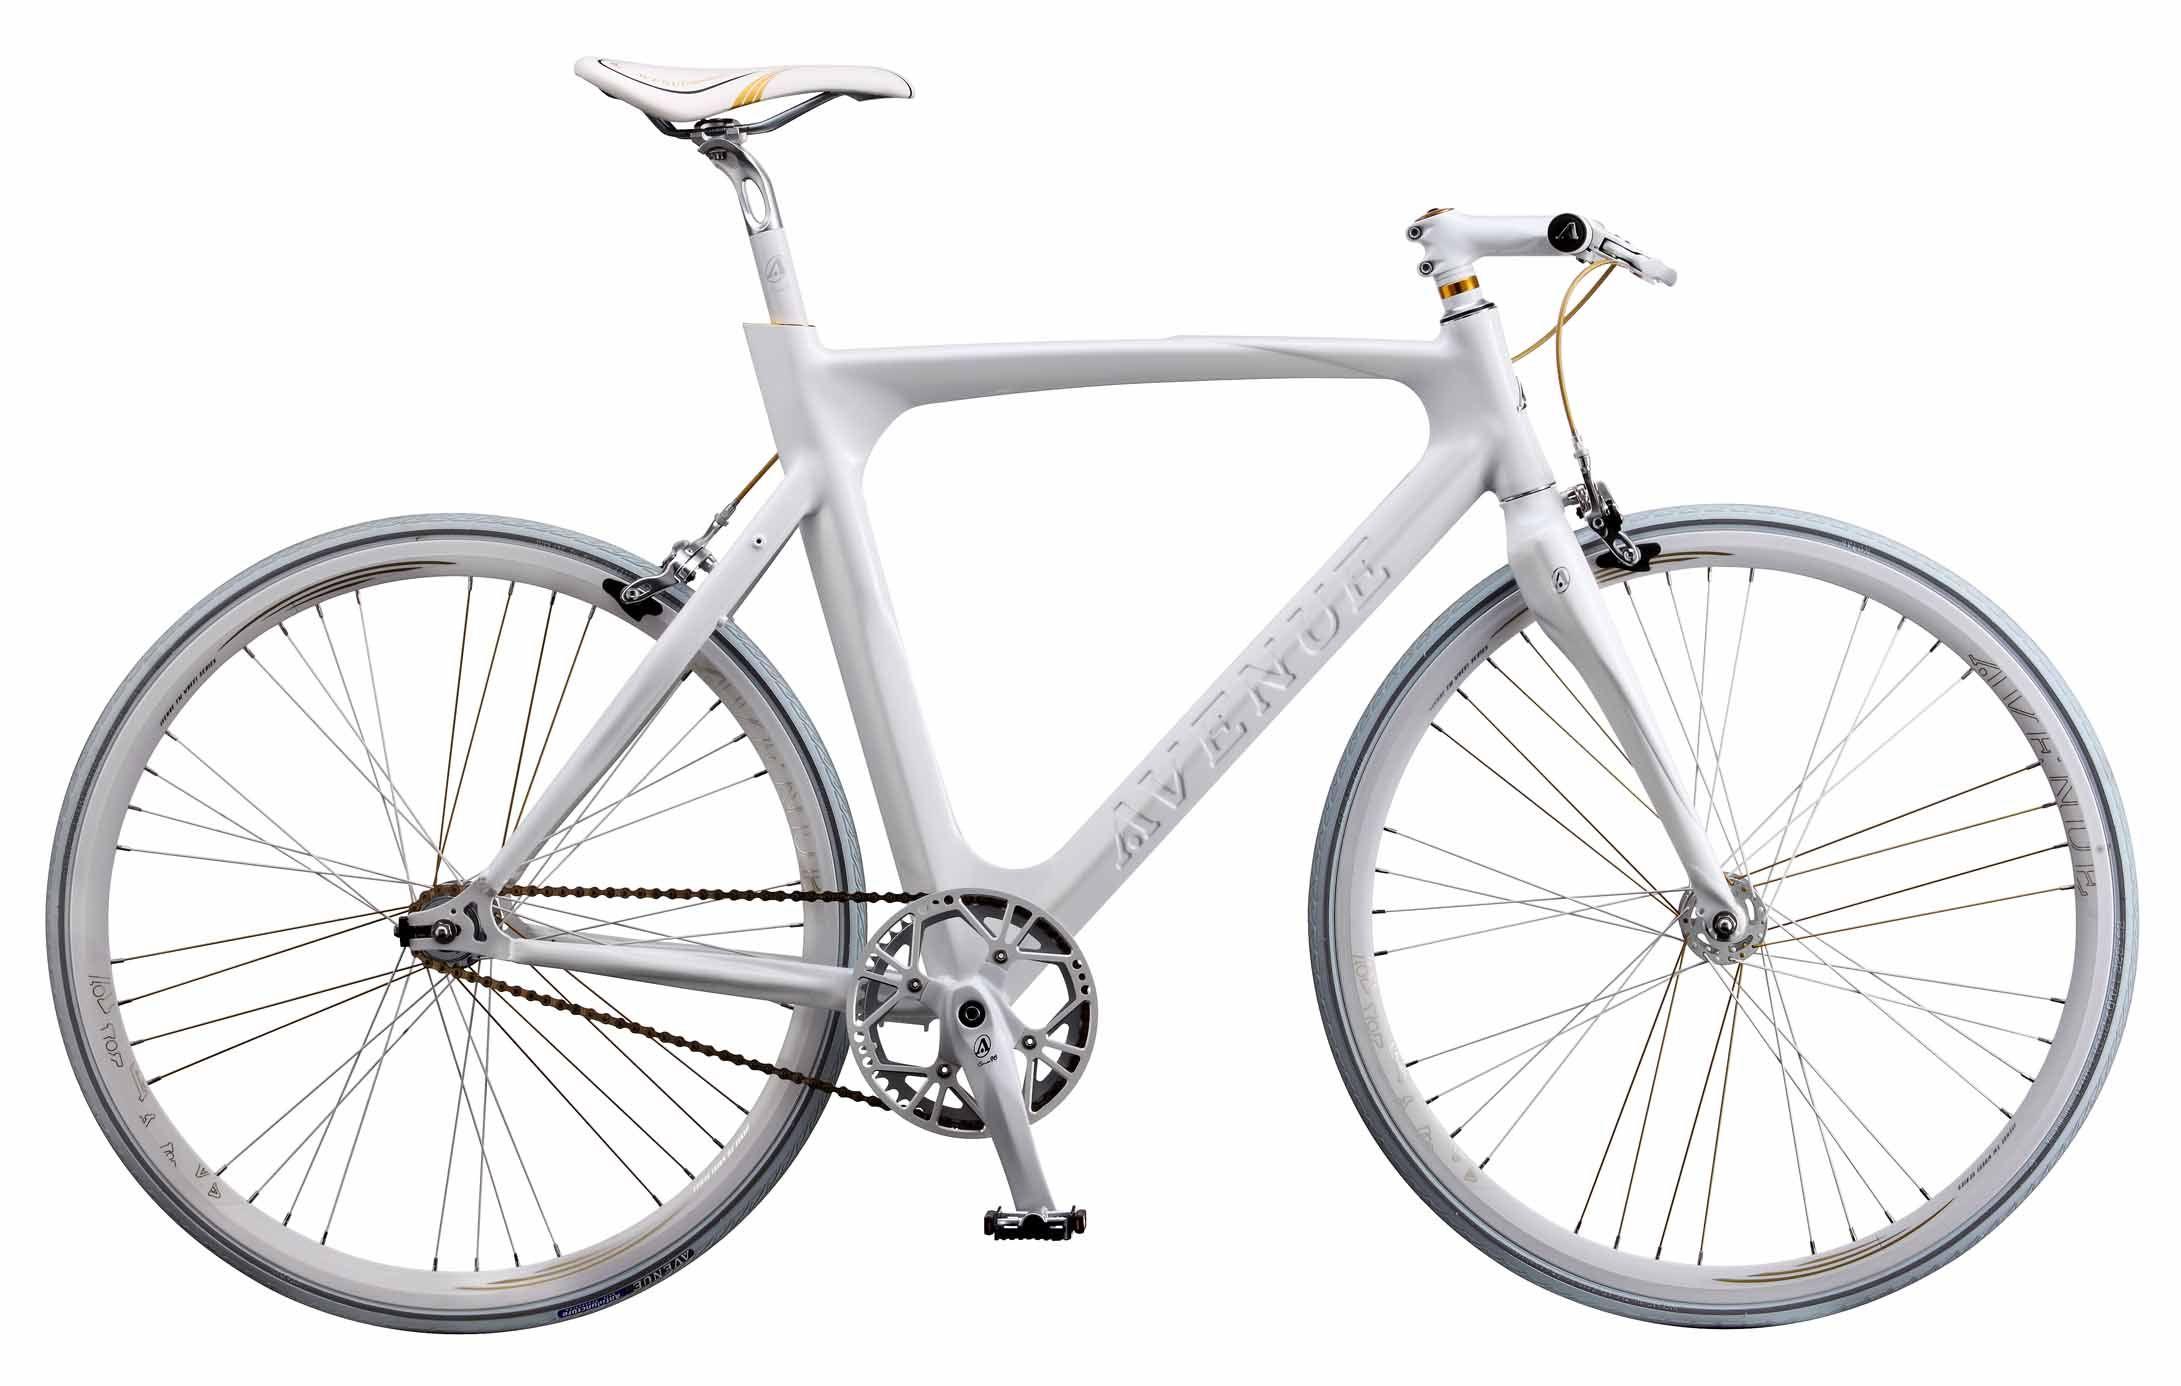 Avenue Bicycles: Airbase Pista urban bike //